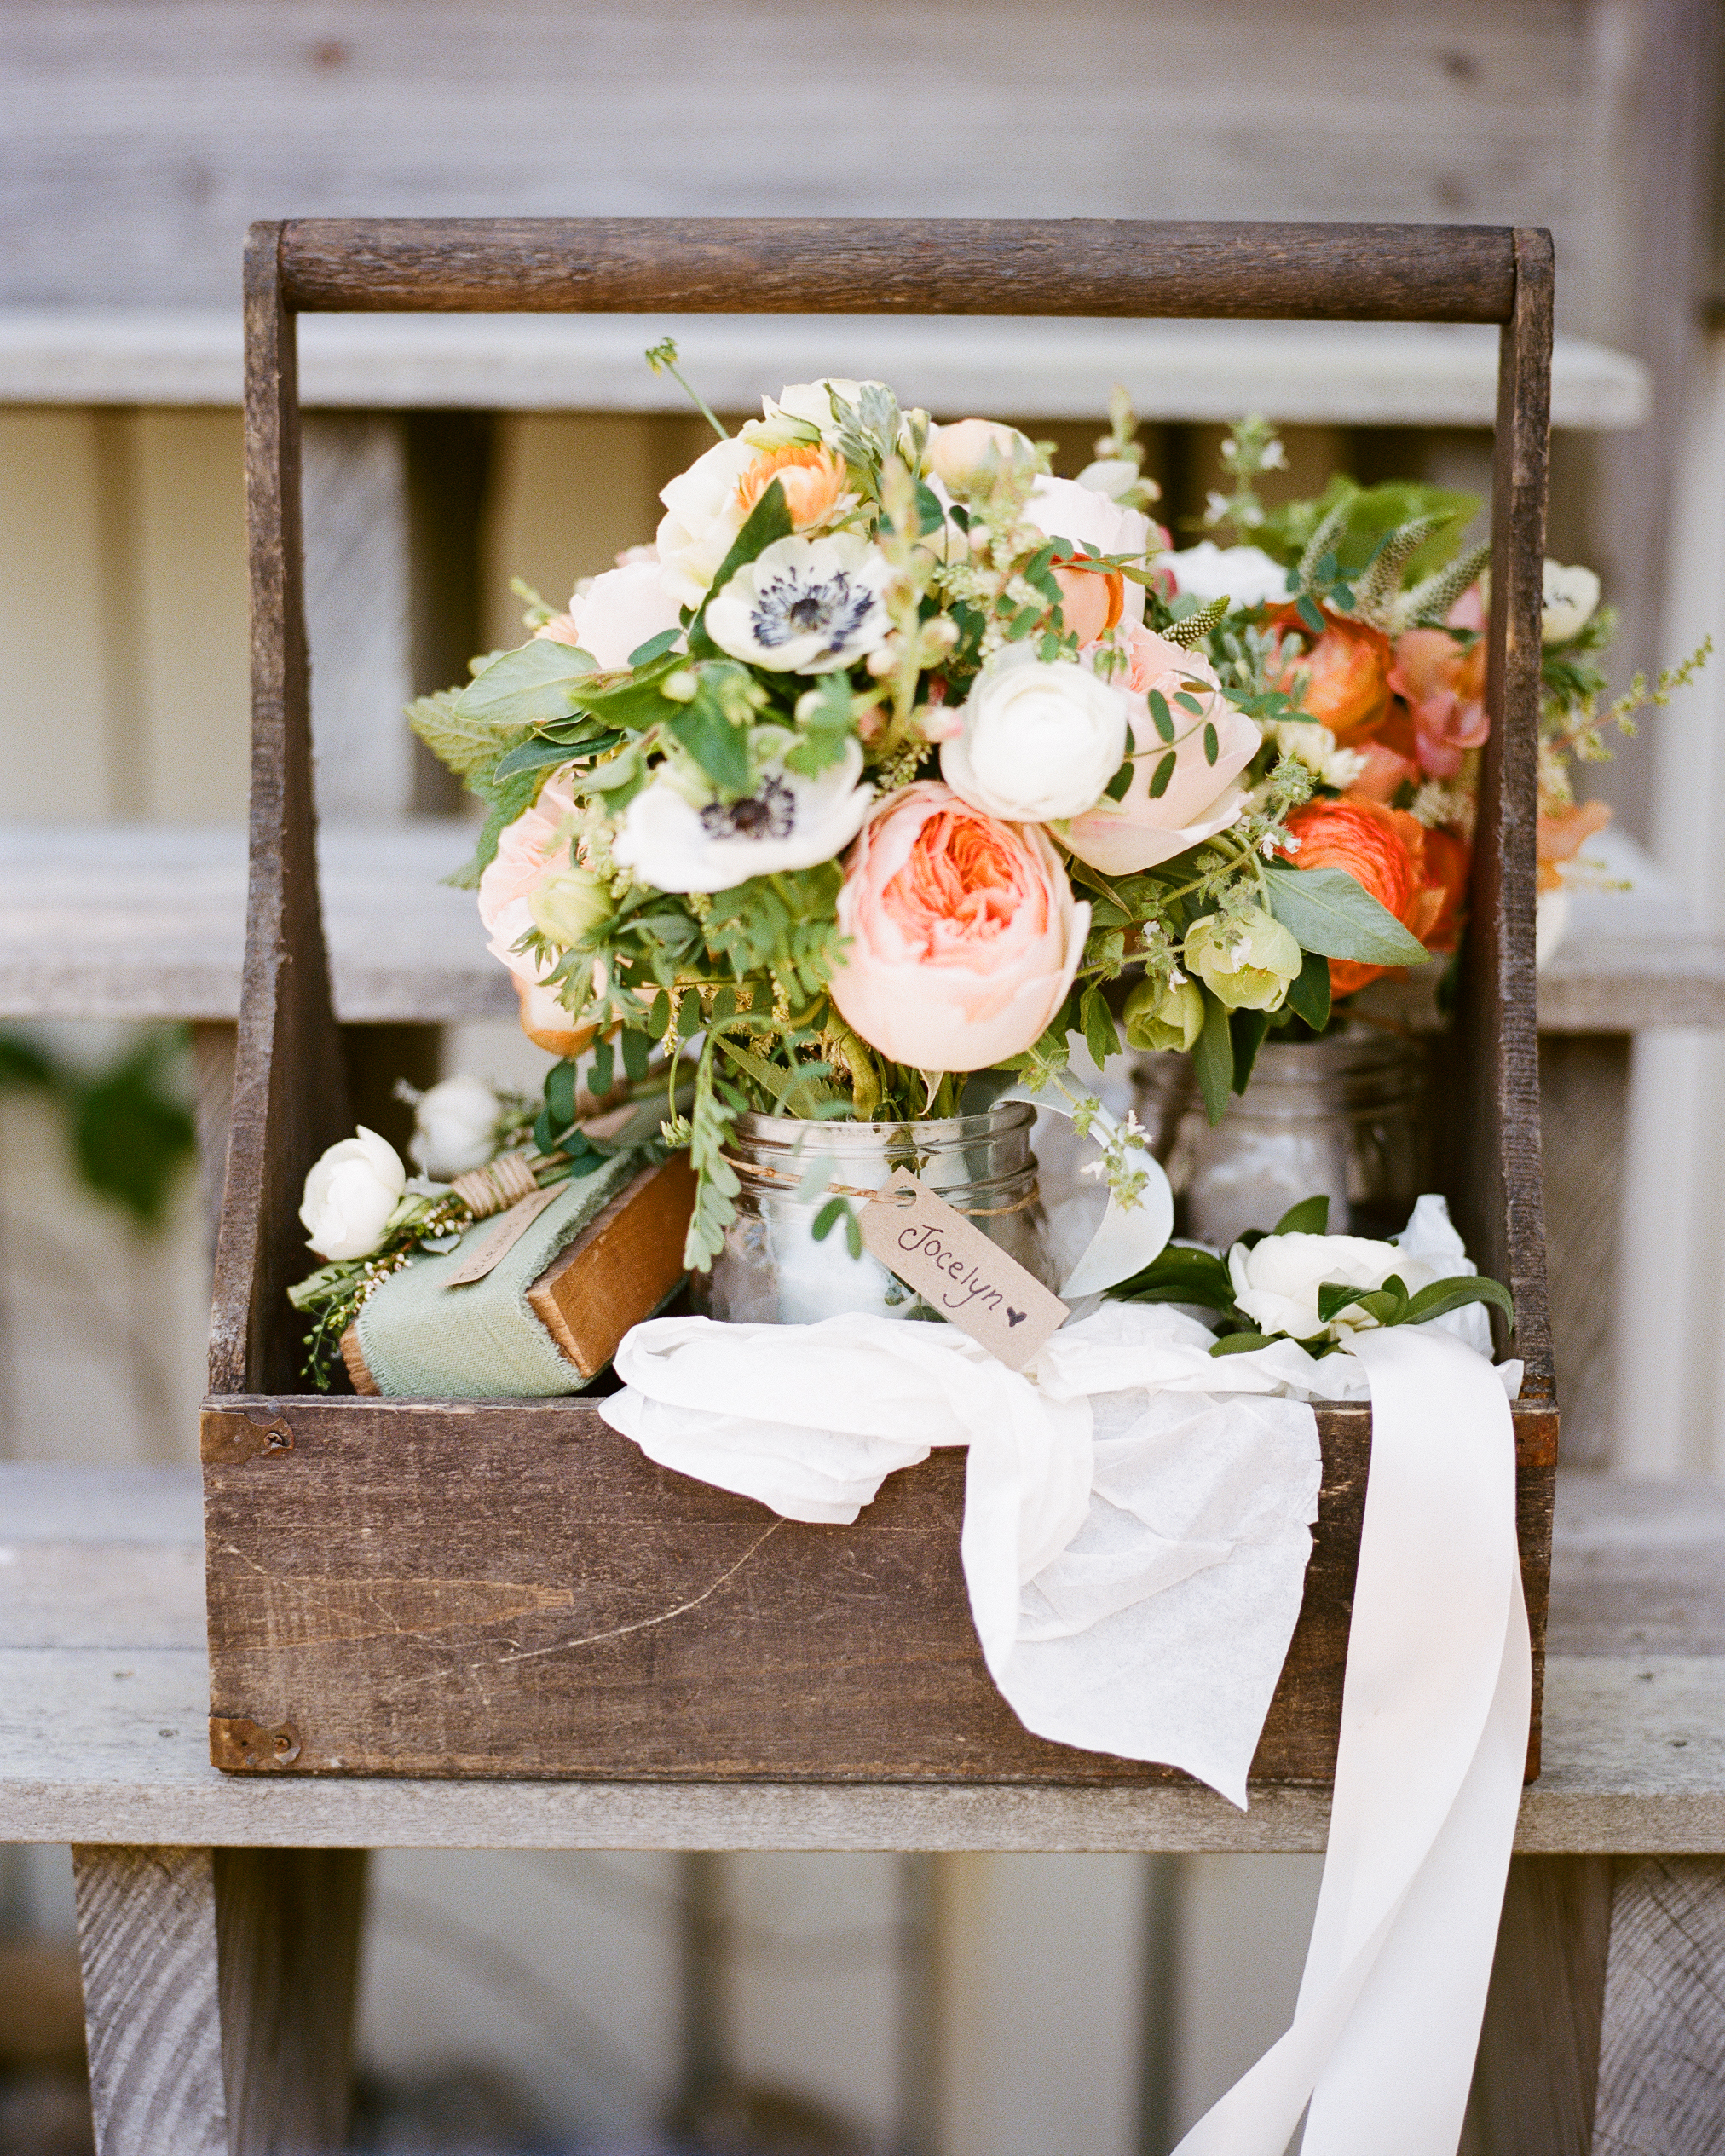 jocelyn-graham-wedding-bouquet-0346-s111847-0315.jpg